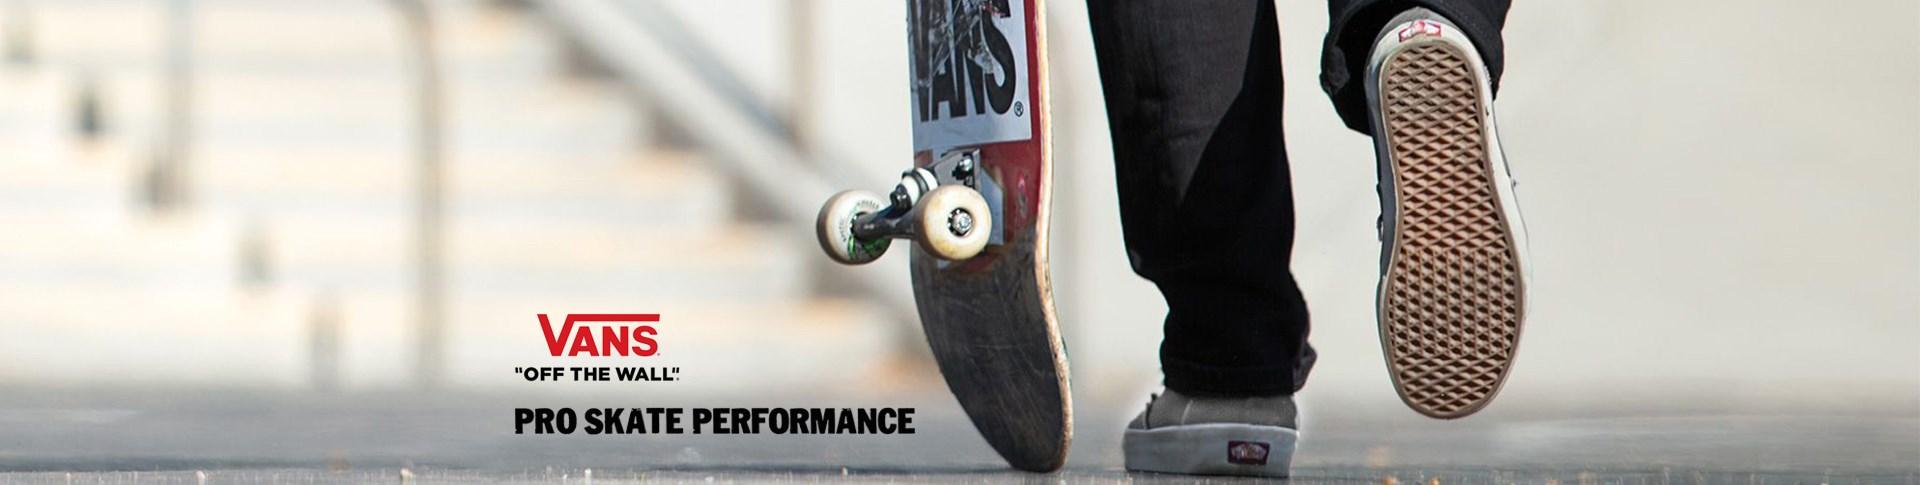 Vans - Pro Skate Perfromance